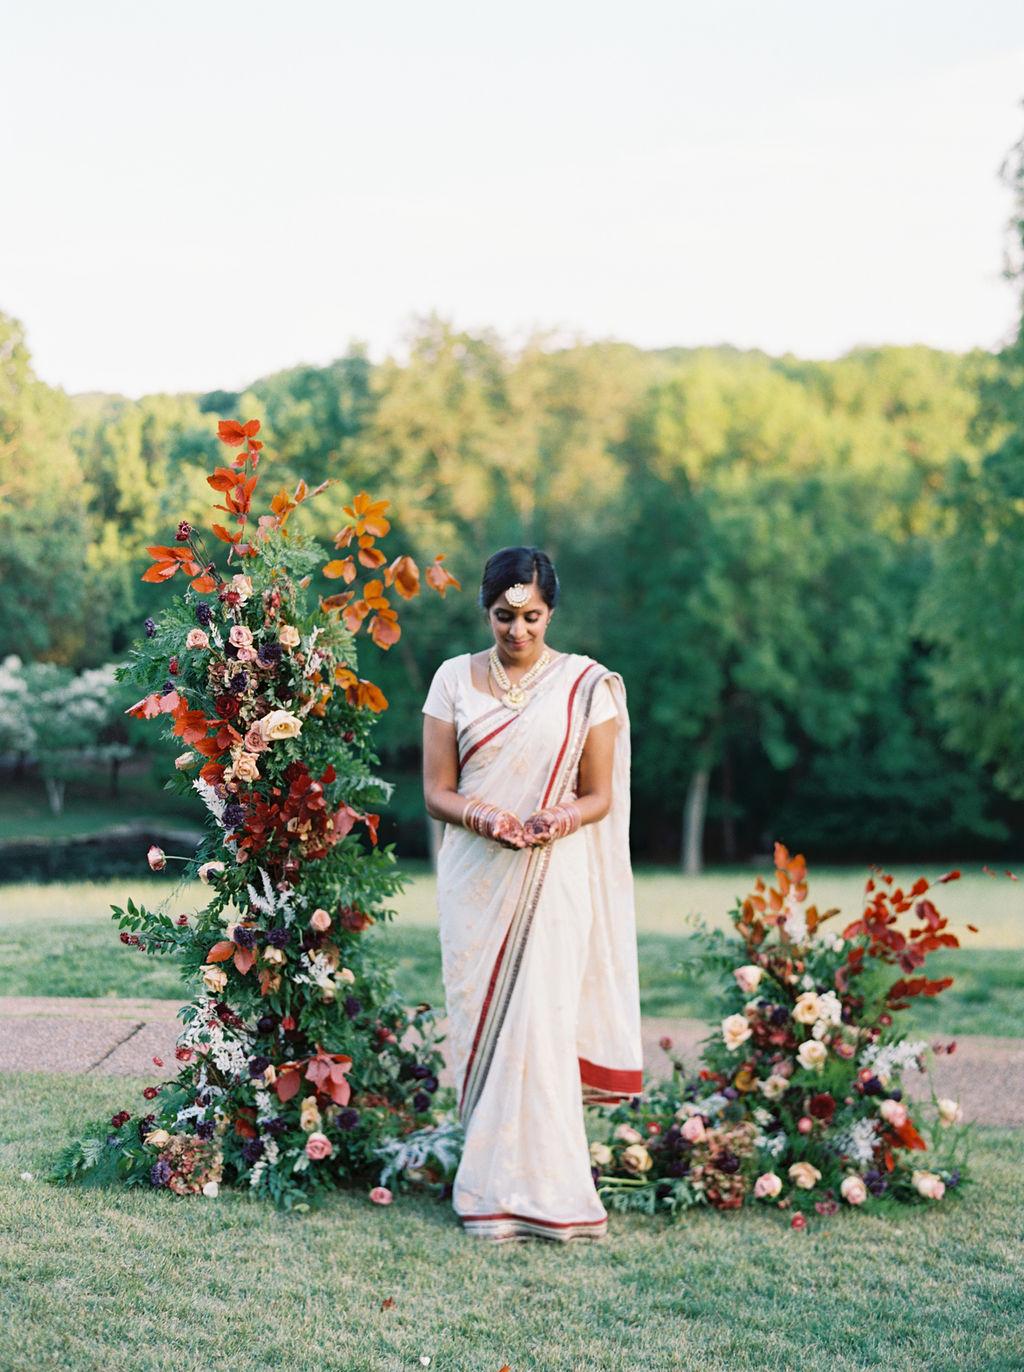 Floral installation tips for designers